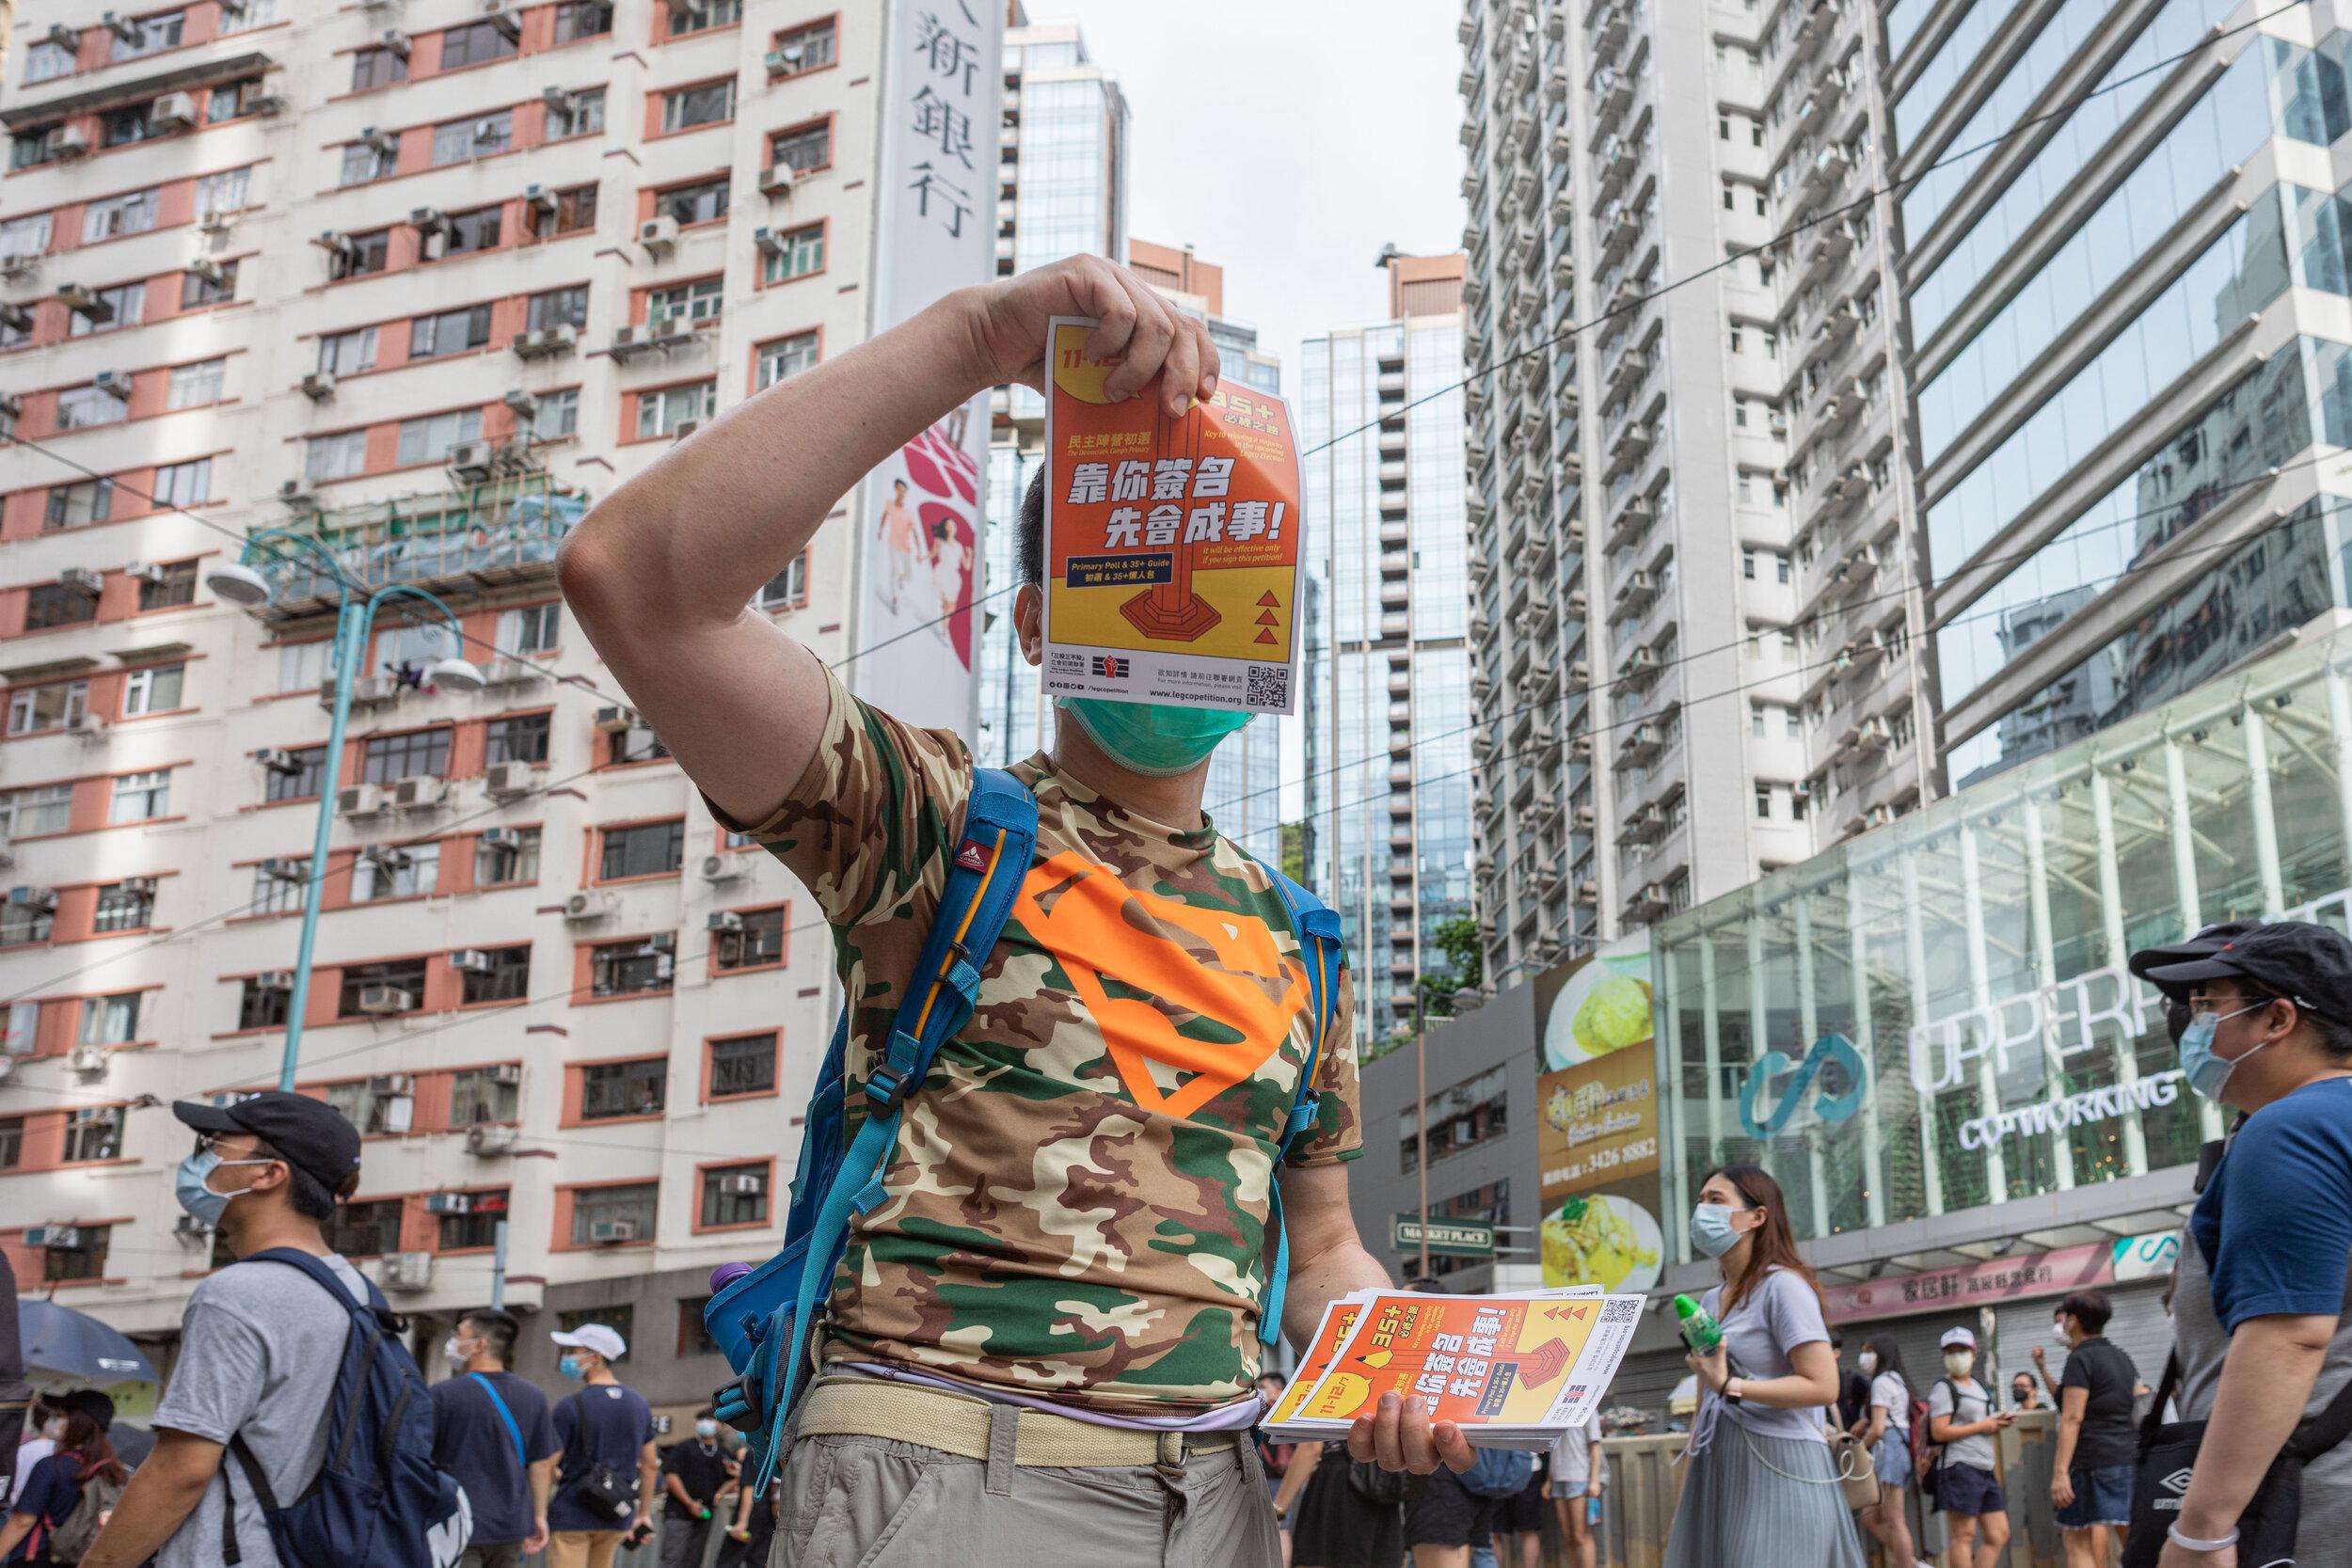 Freedom protest Hong Kong Belinda Jiao.jpeg